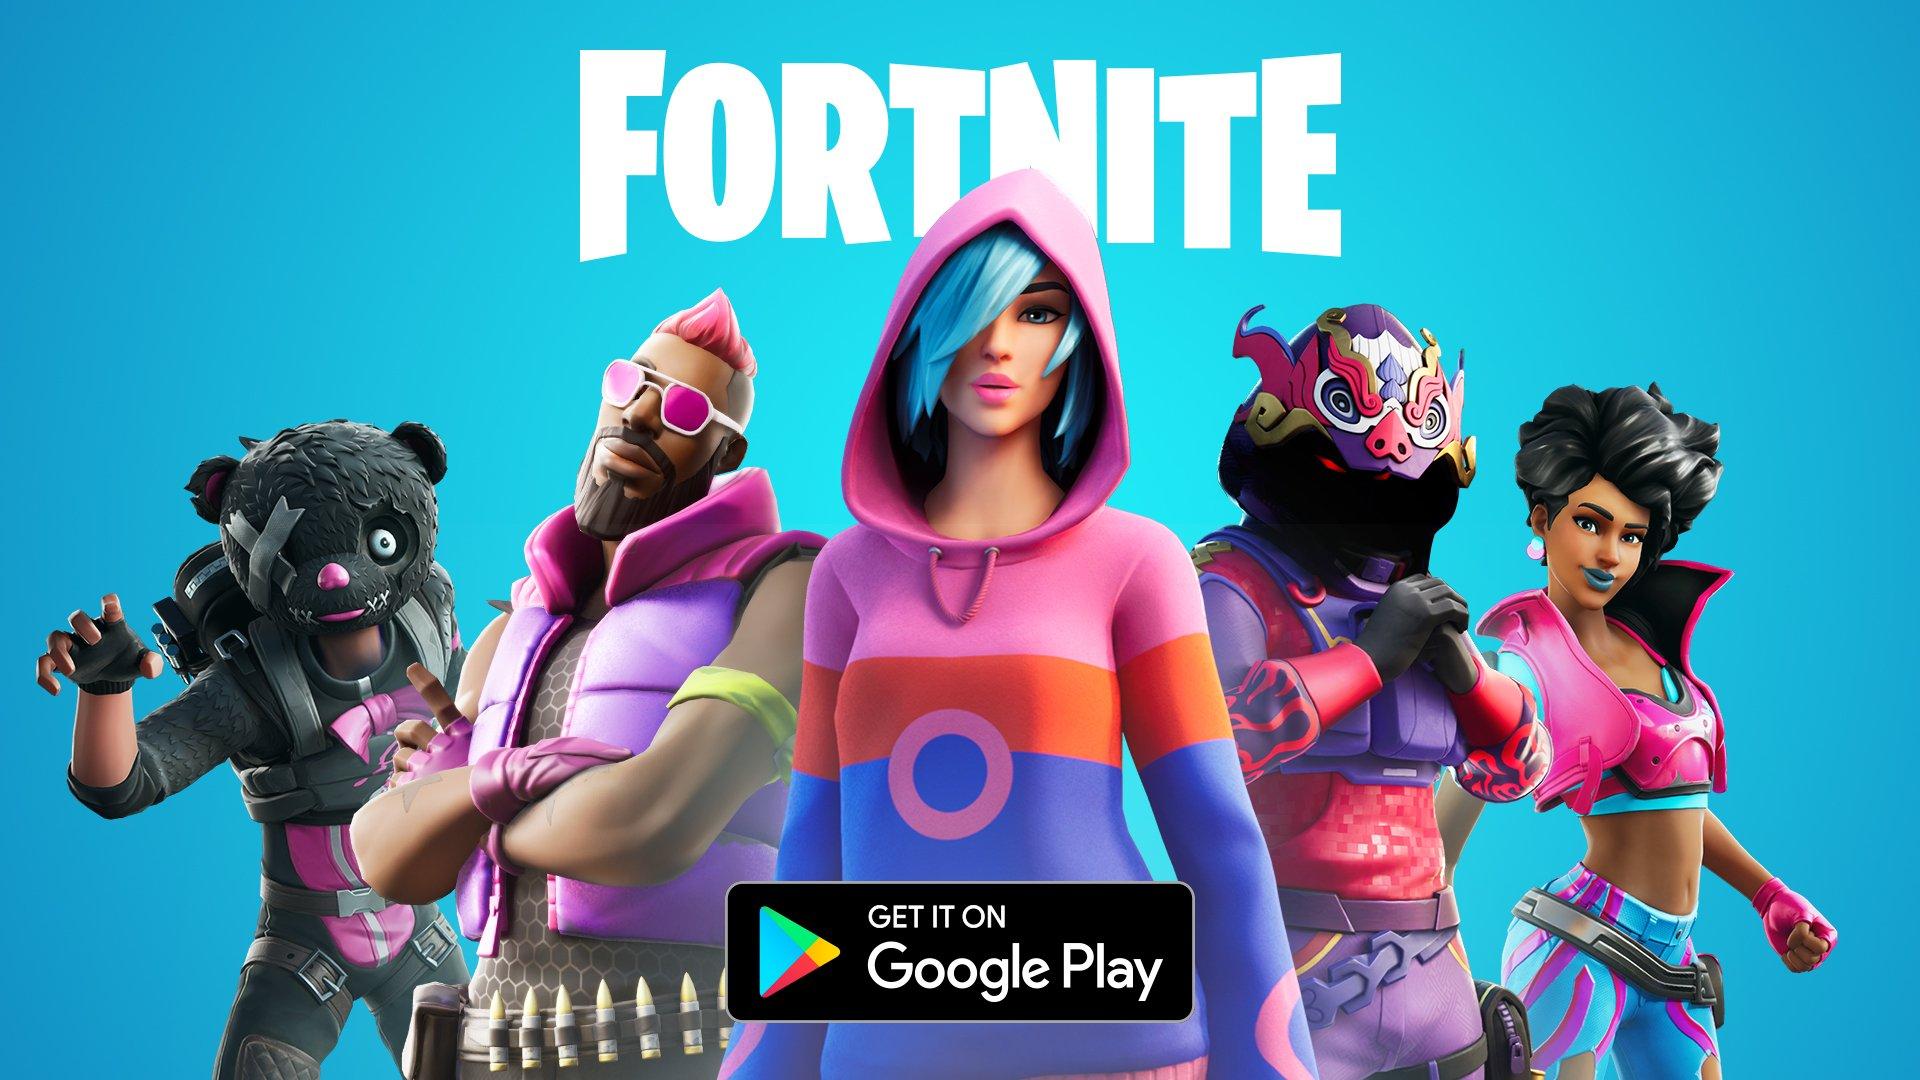 fortnite play.jpg